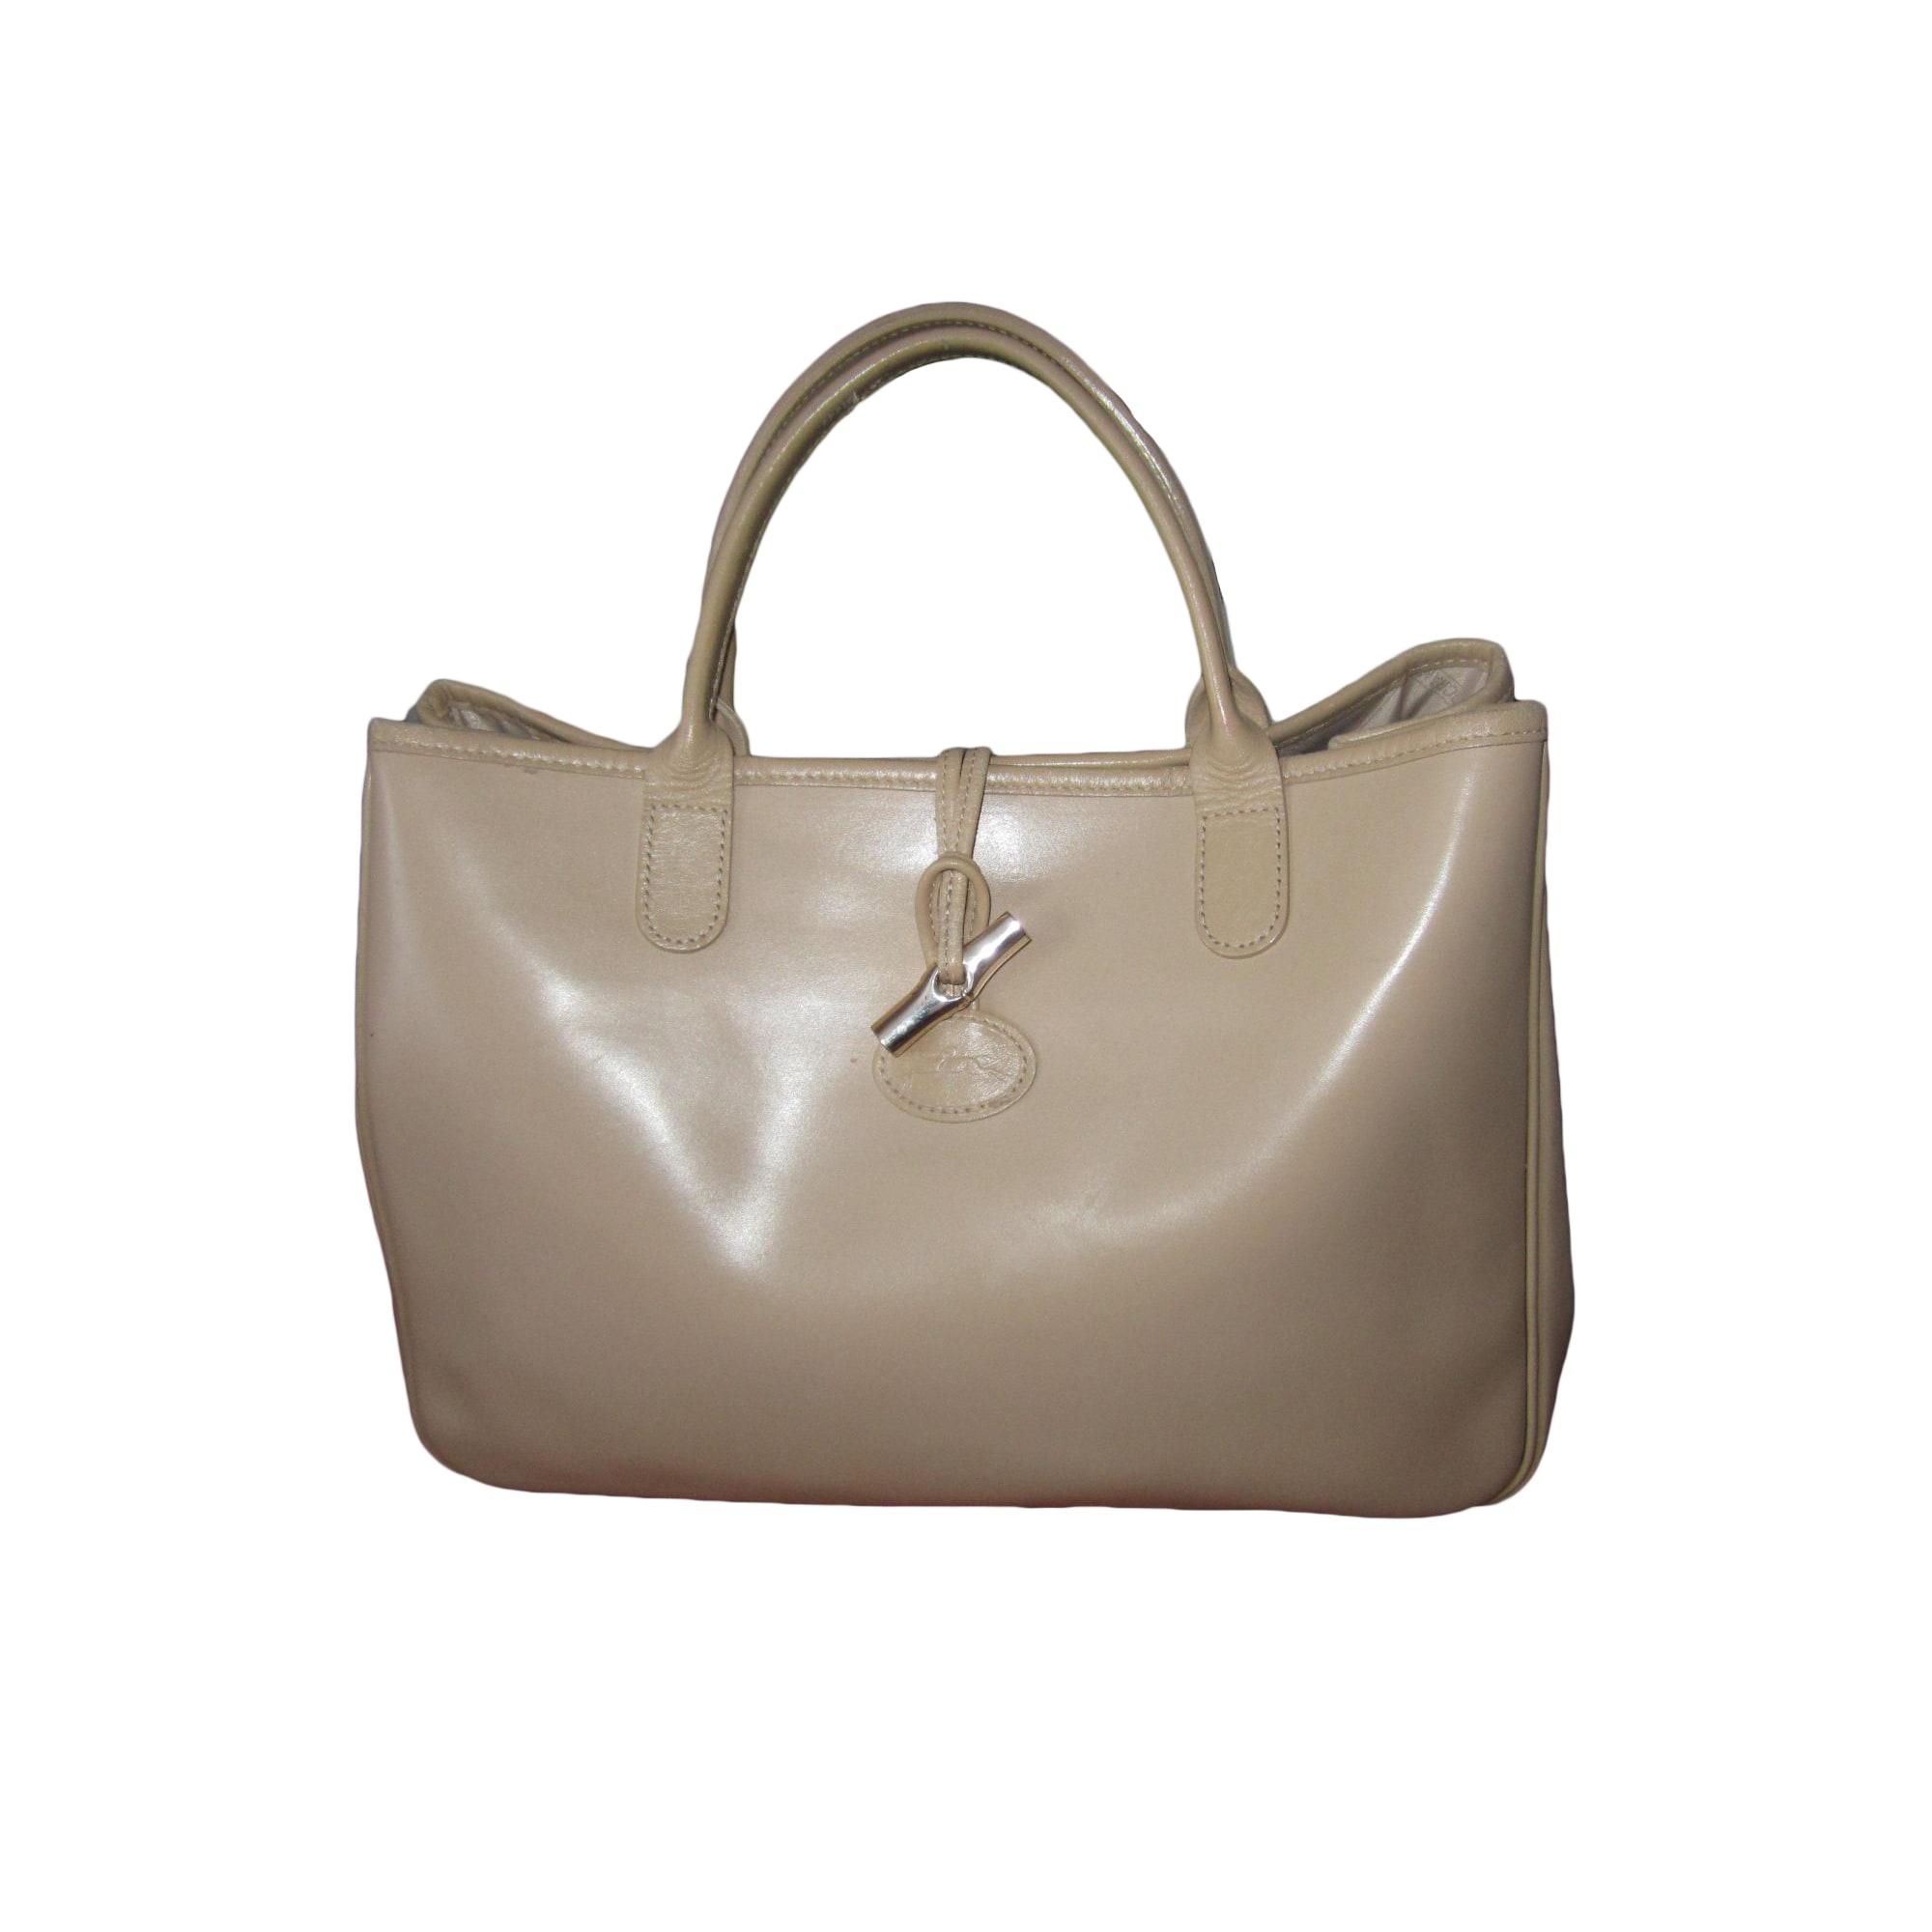 Shopping > longchamp sac beige, Up to 68% OFF